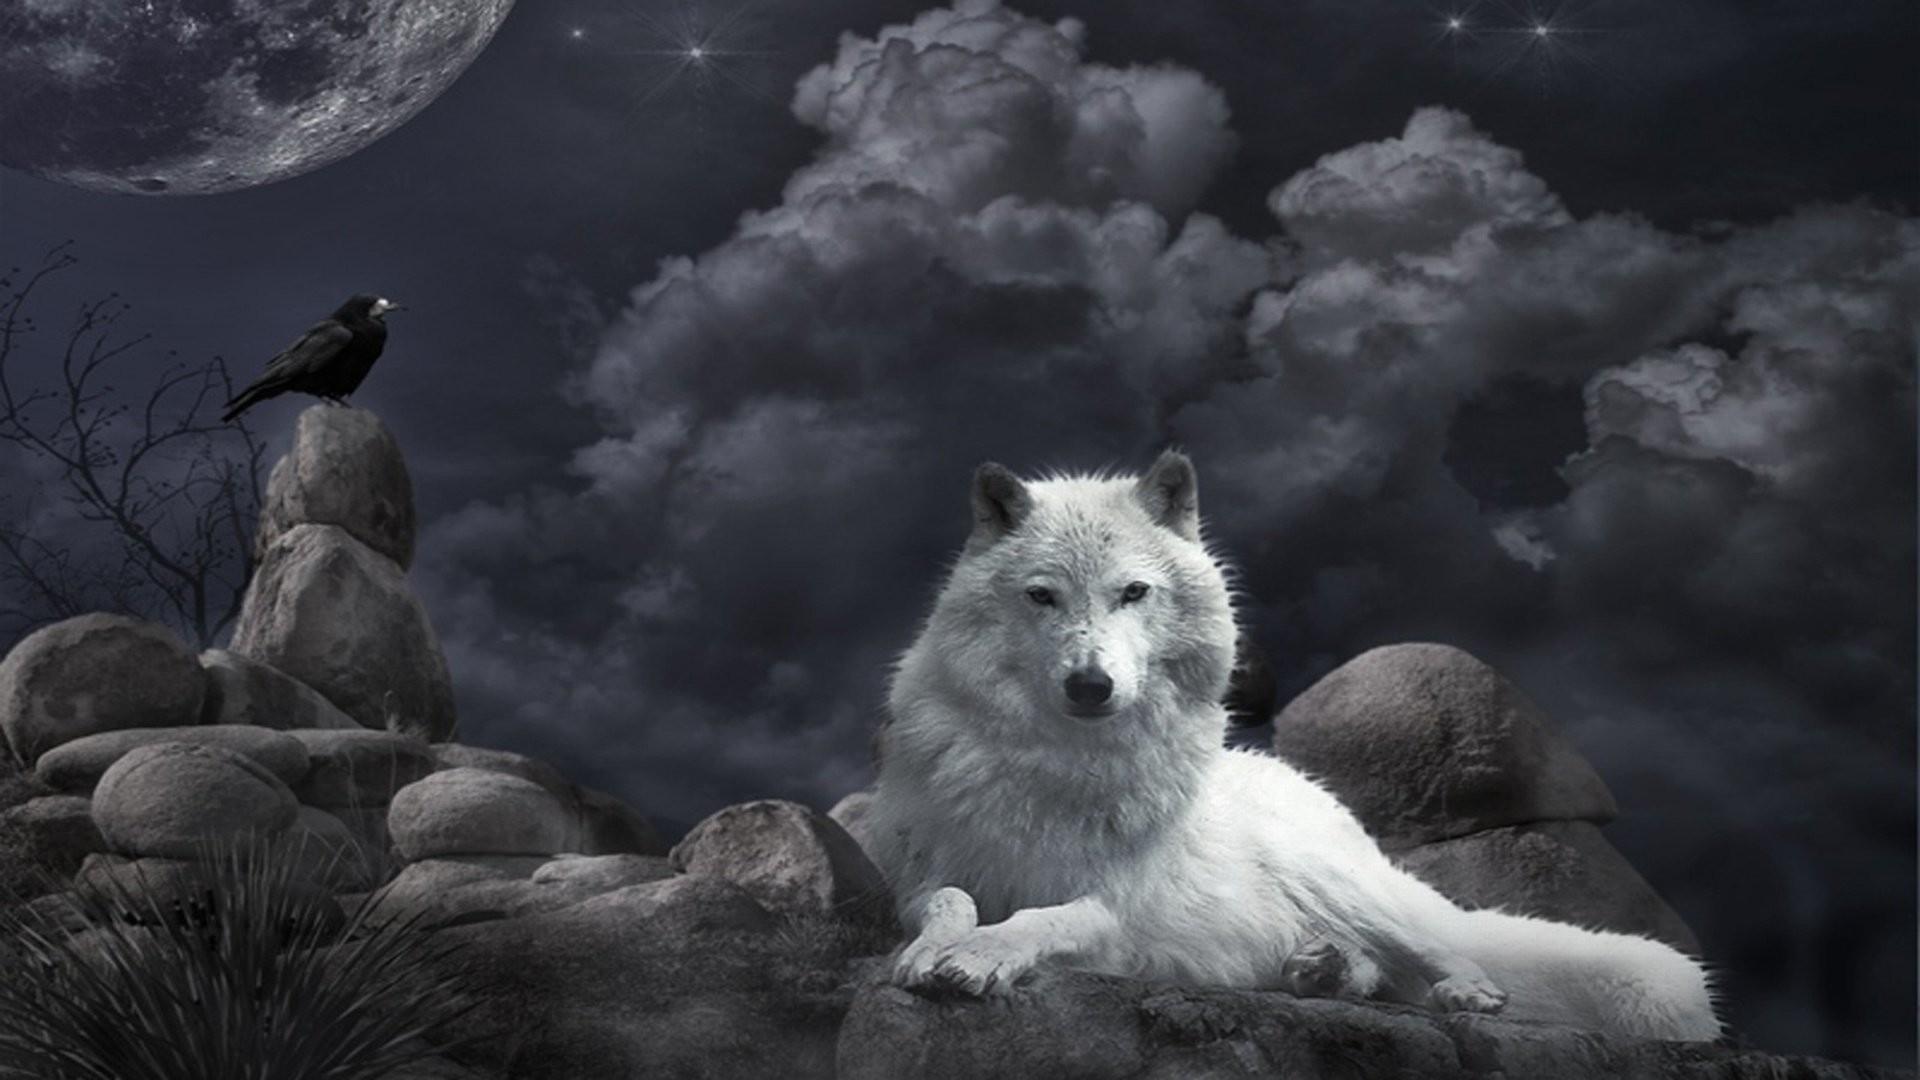 Beautiful wolf hd new desktop wallpaper